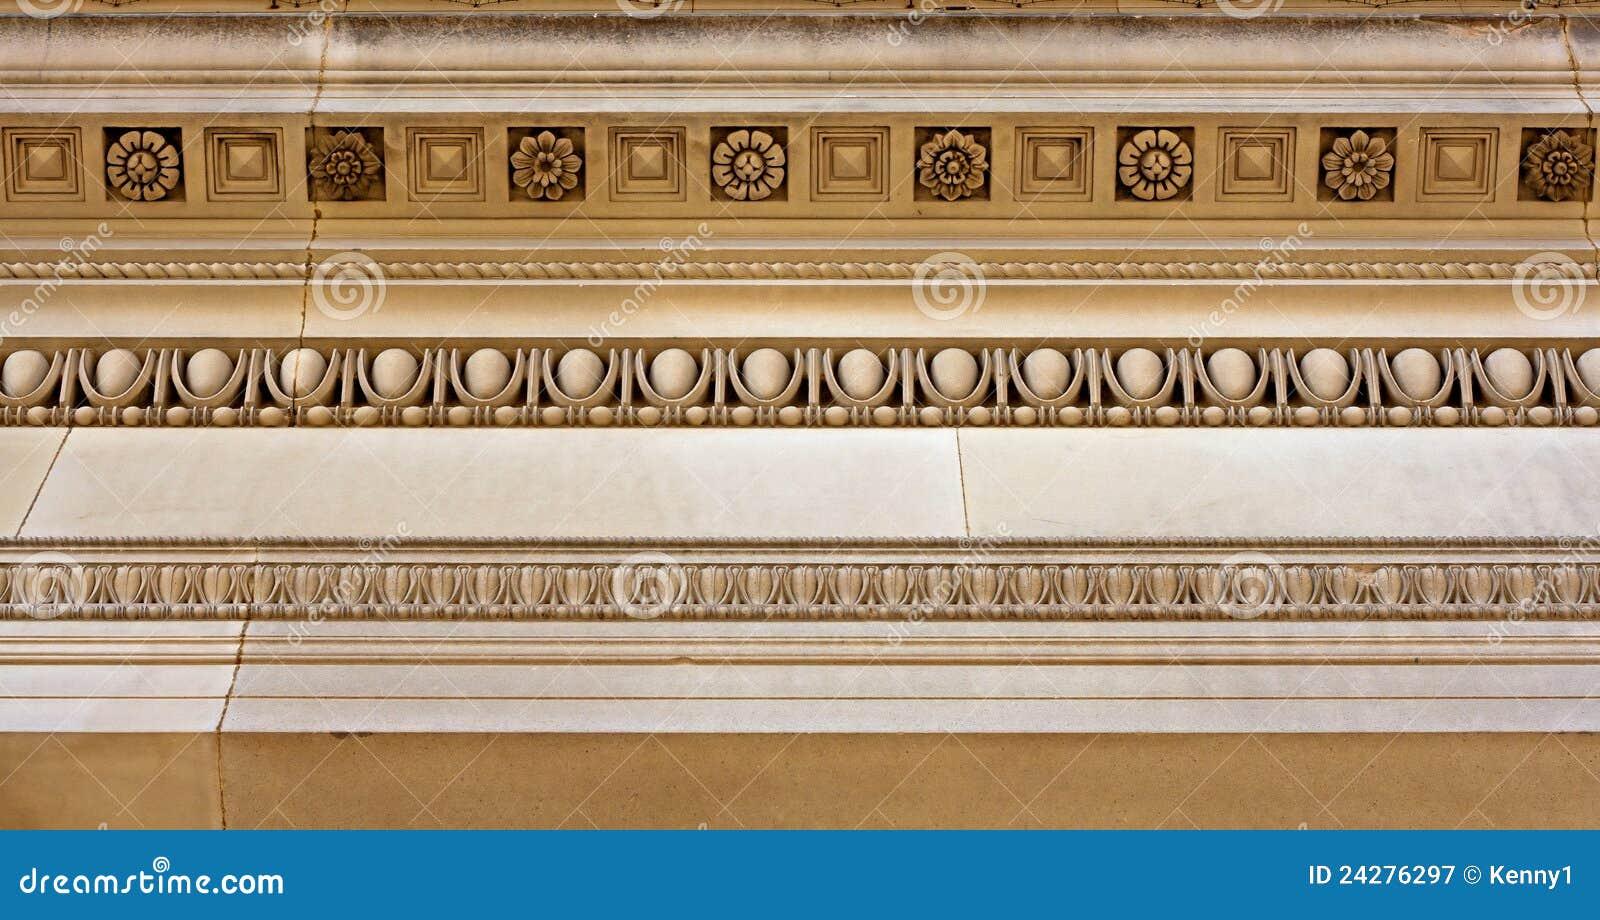 Intricate Sandstone Cornice Work Stock Image Image Of